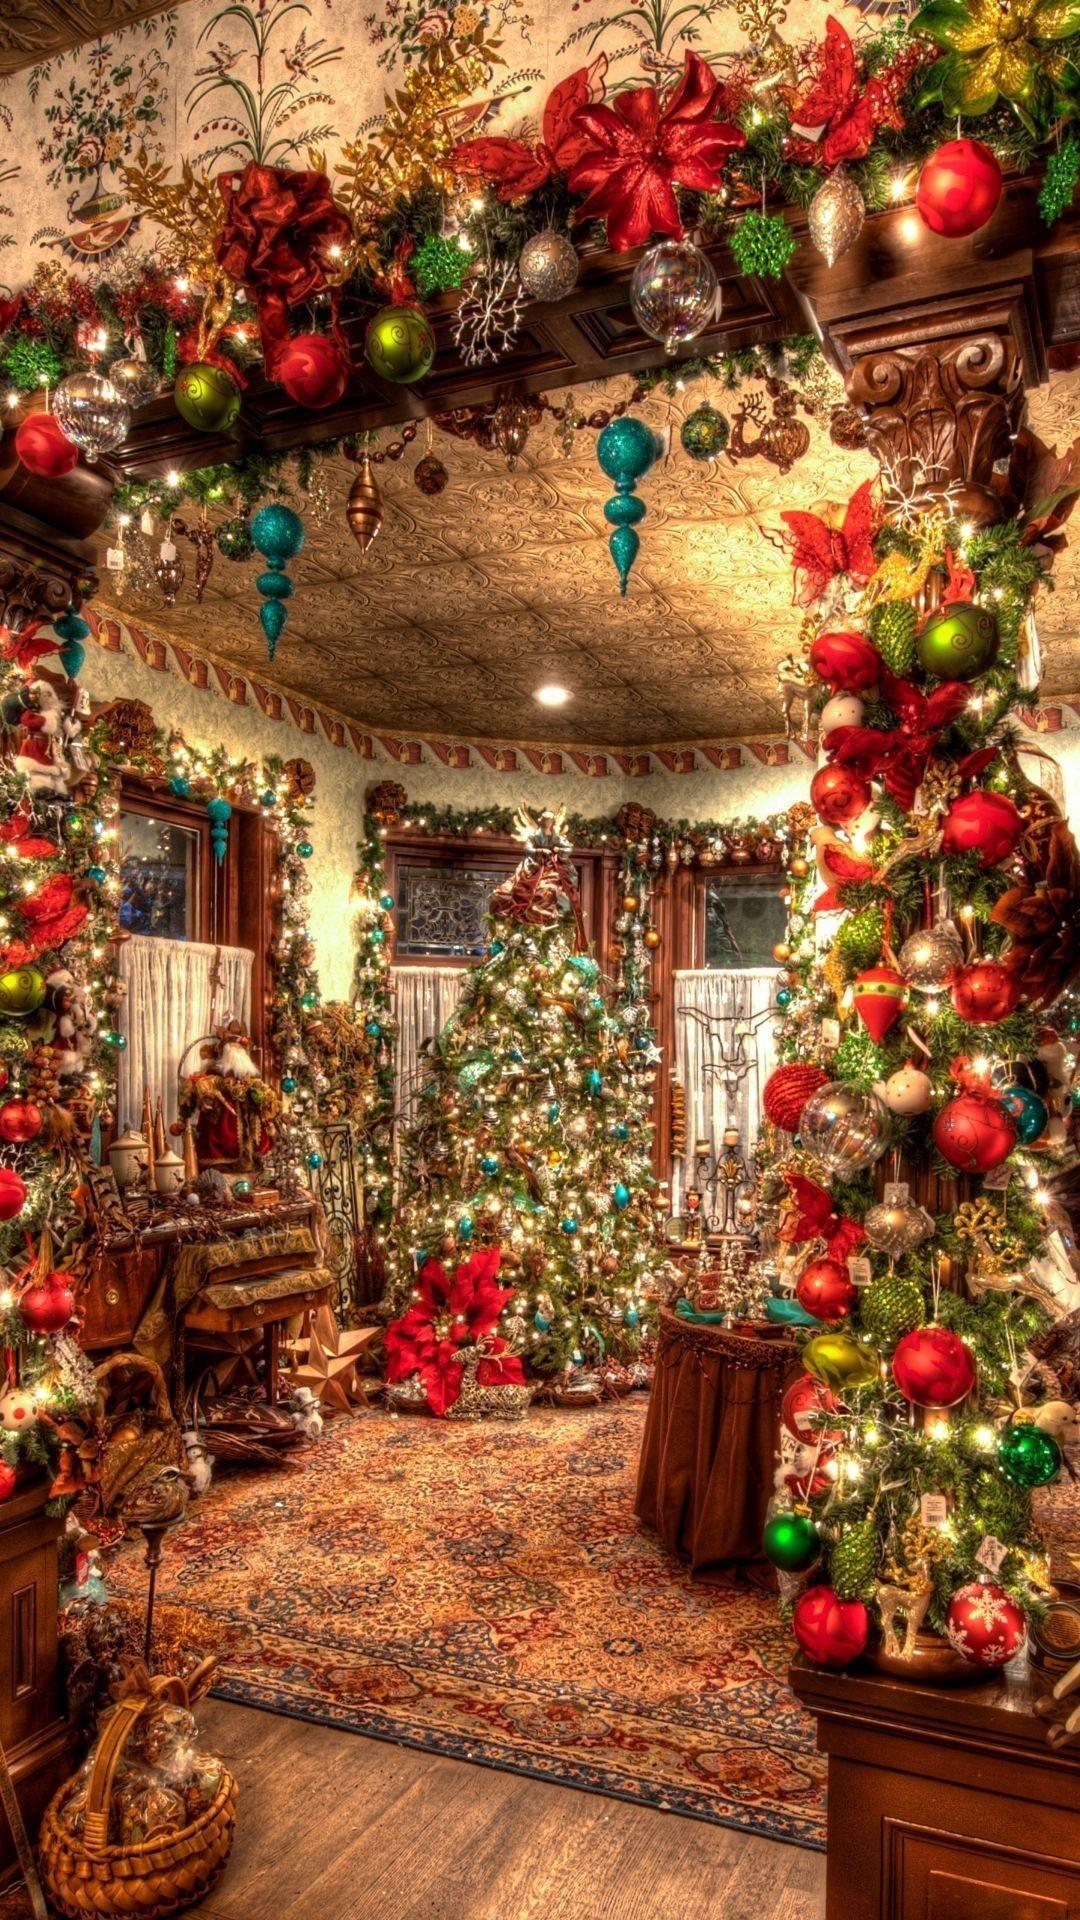 4k christmas wallpaper (51+ images)